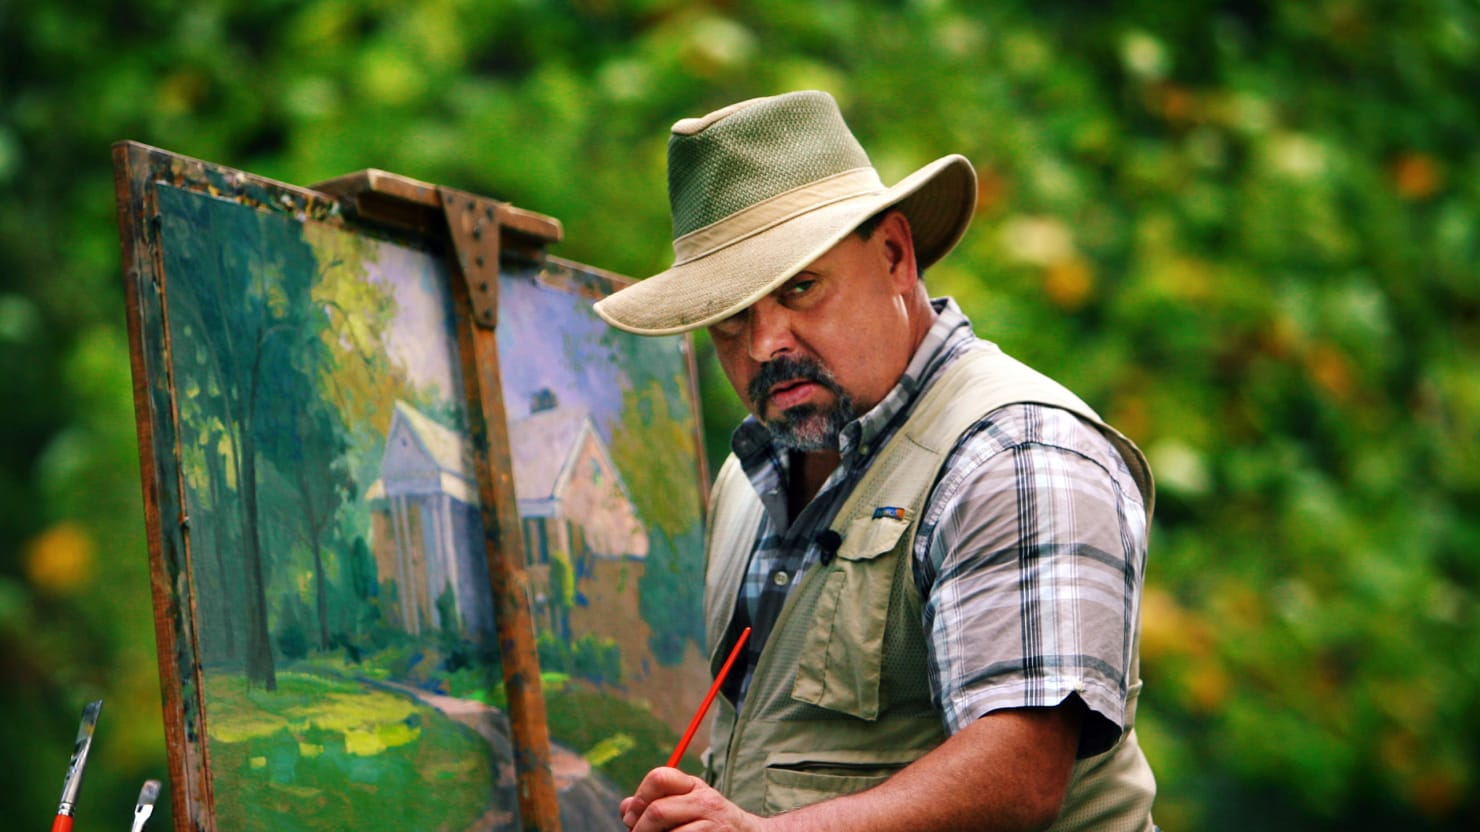 The Drunken Downfall Of Evangelical America S Favorite Painter